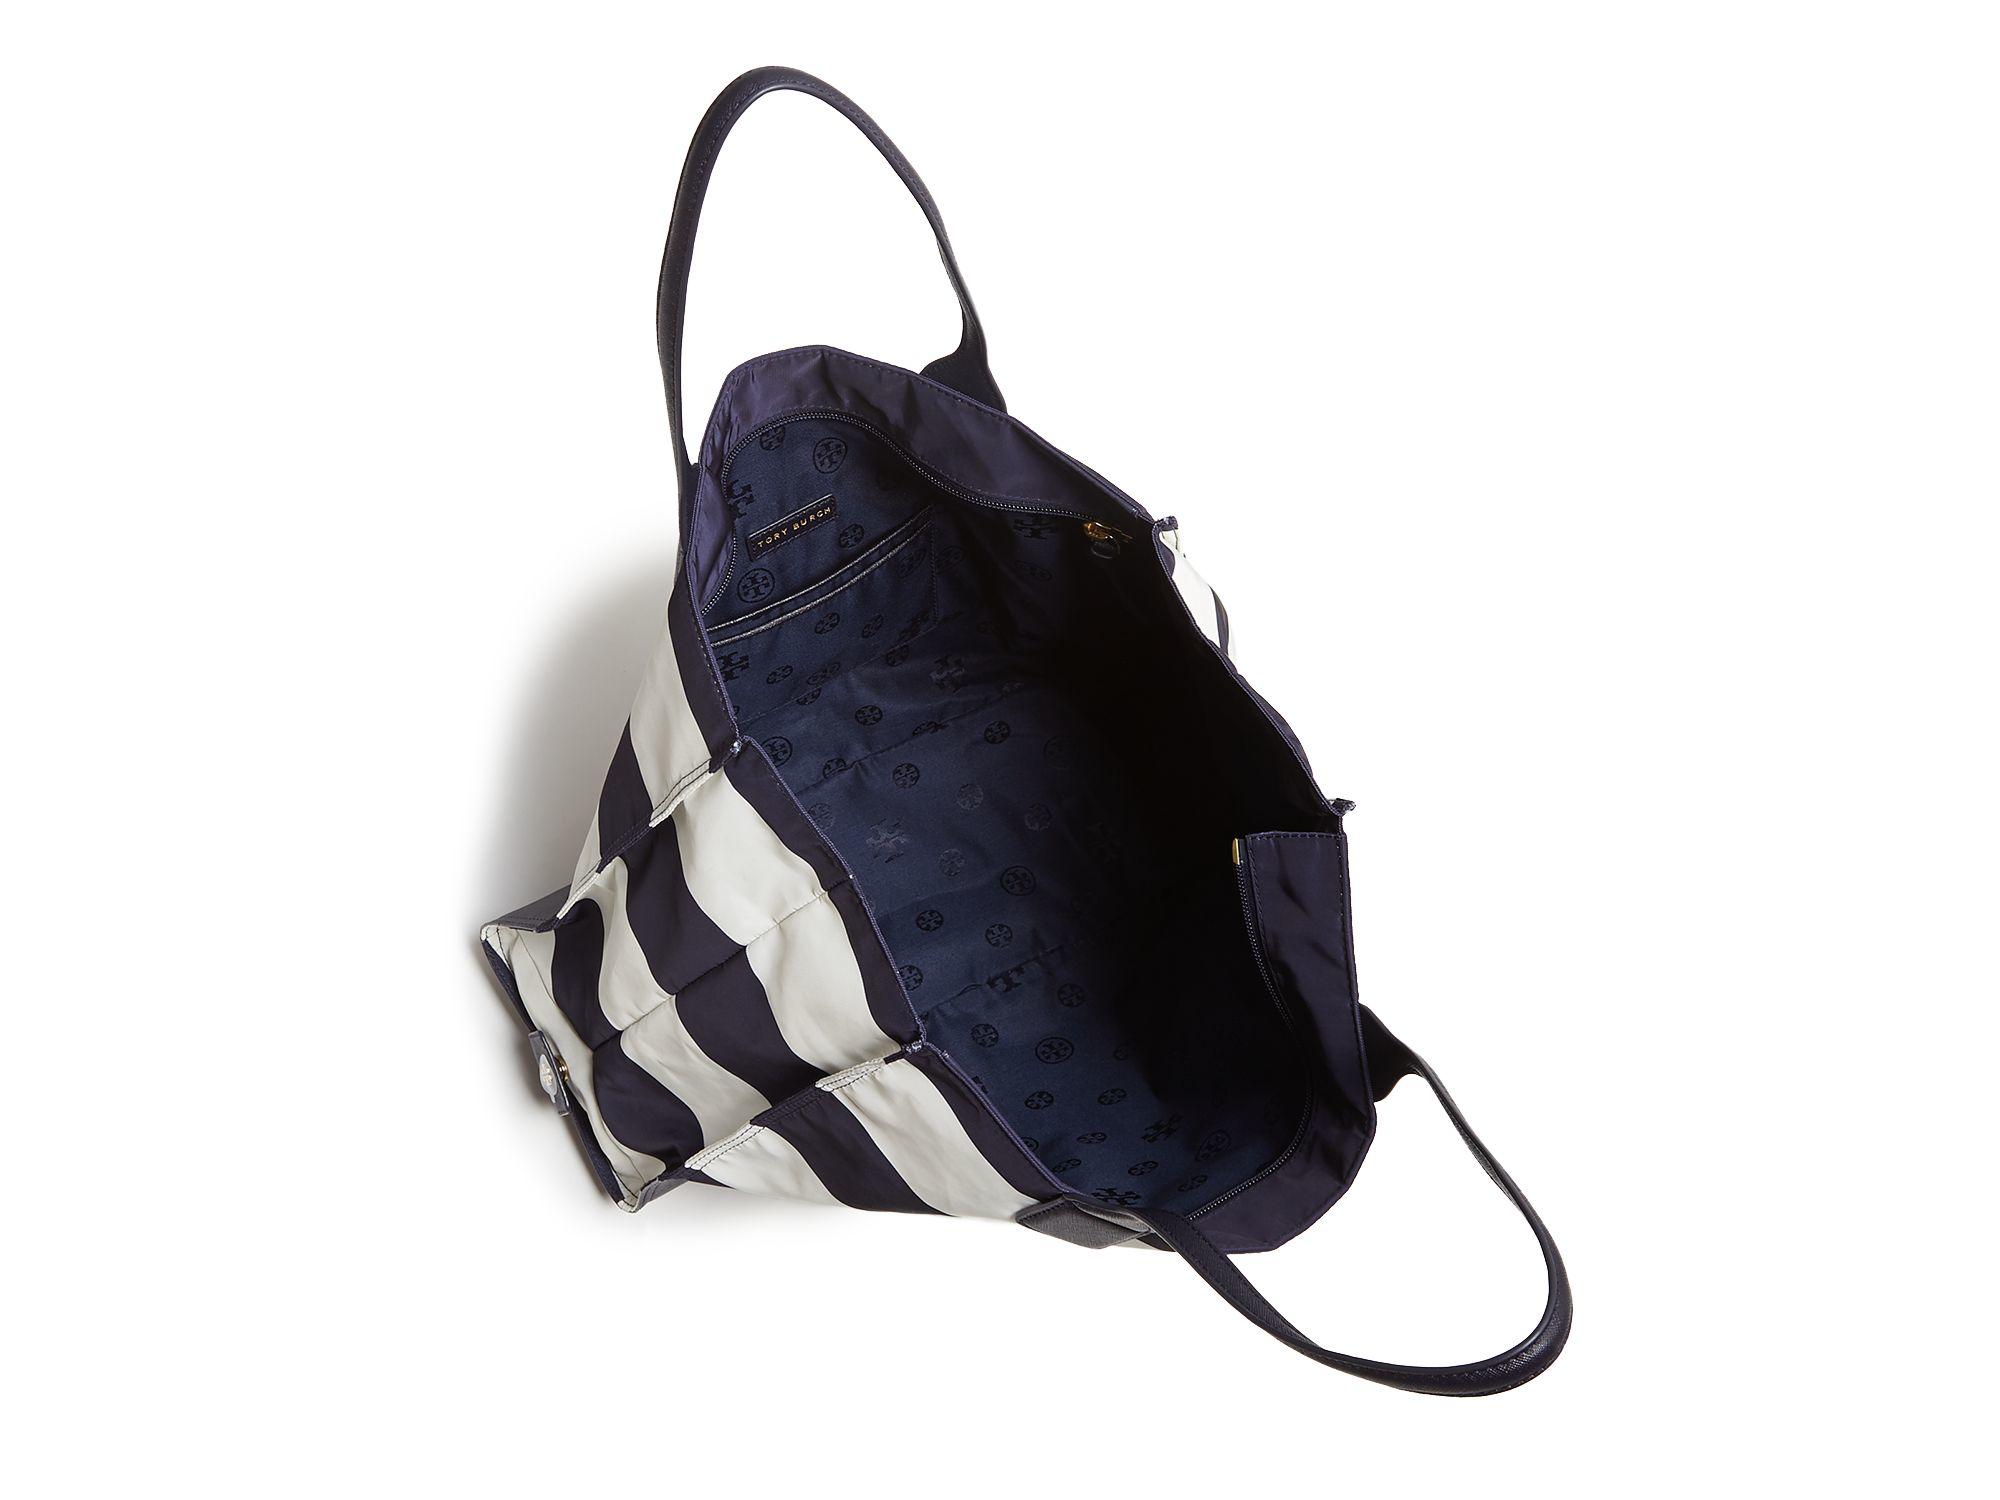 d785fe8159ef Tory Burch Packable Nylon Backpack- Fenix Toulouse Handball